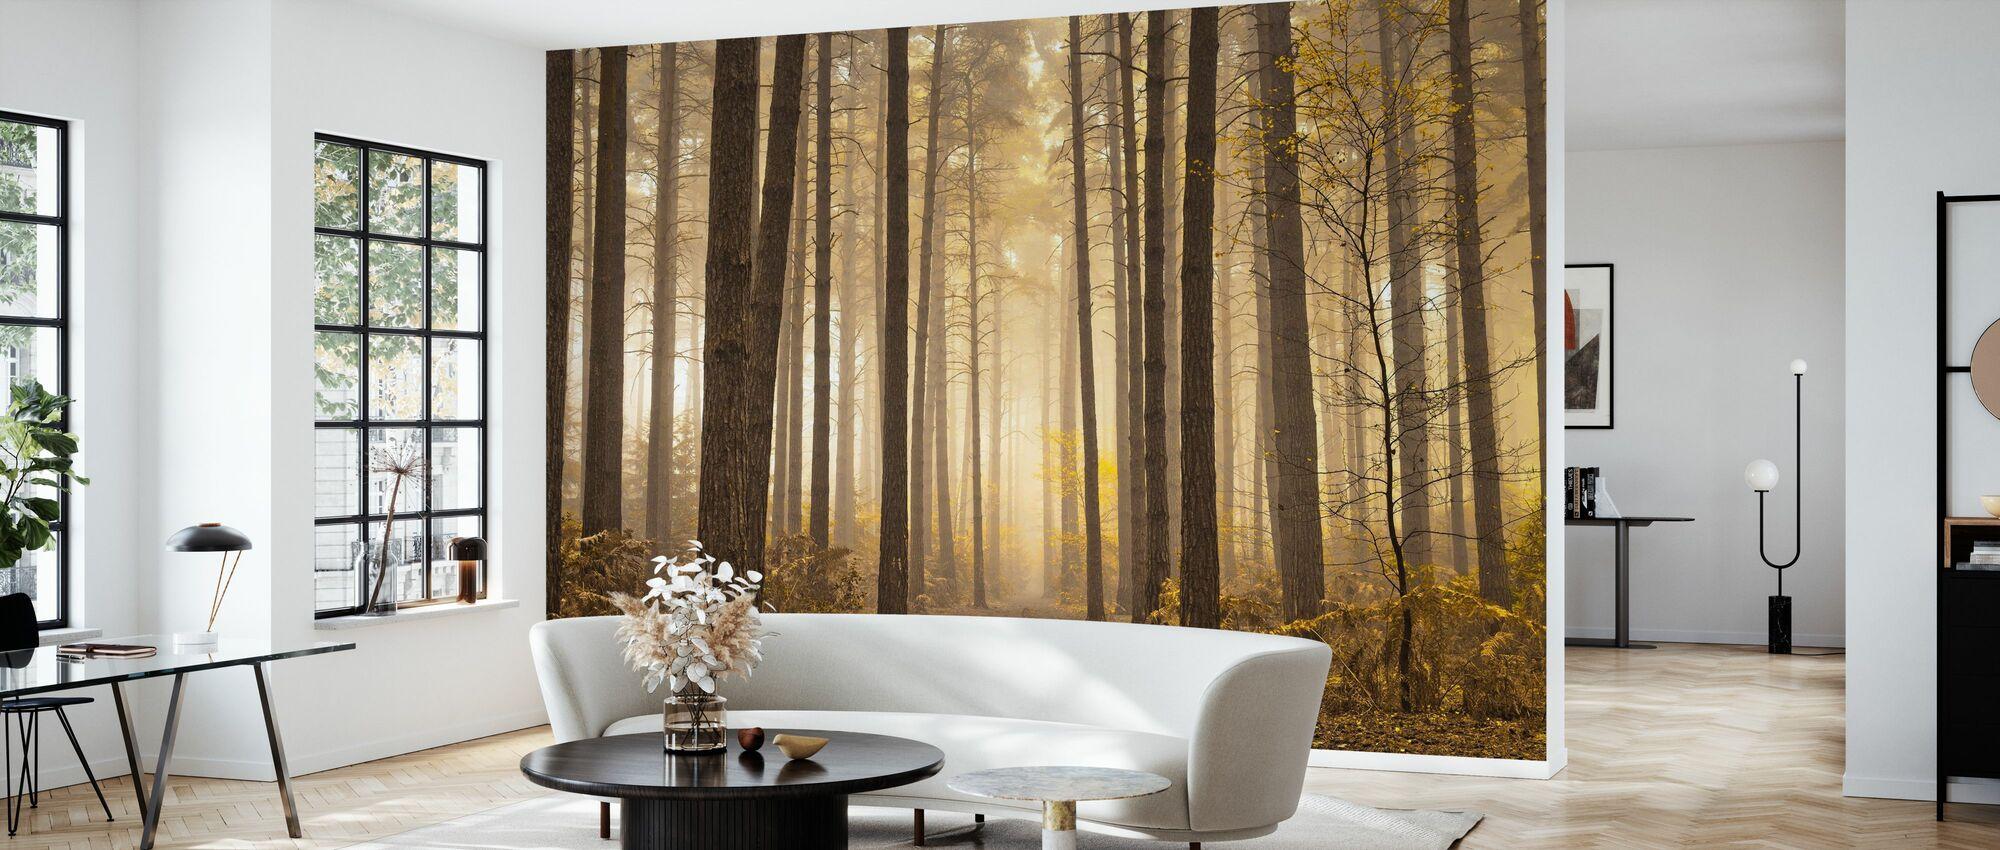 Misty Trees - Wallpaper - Living Room